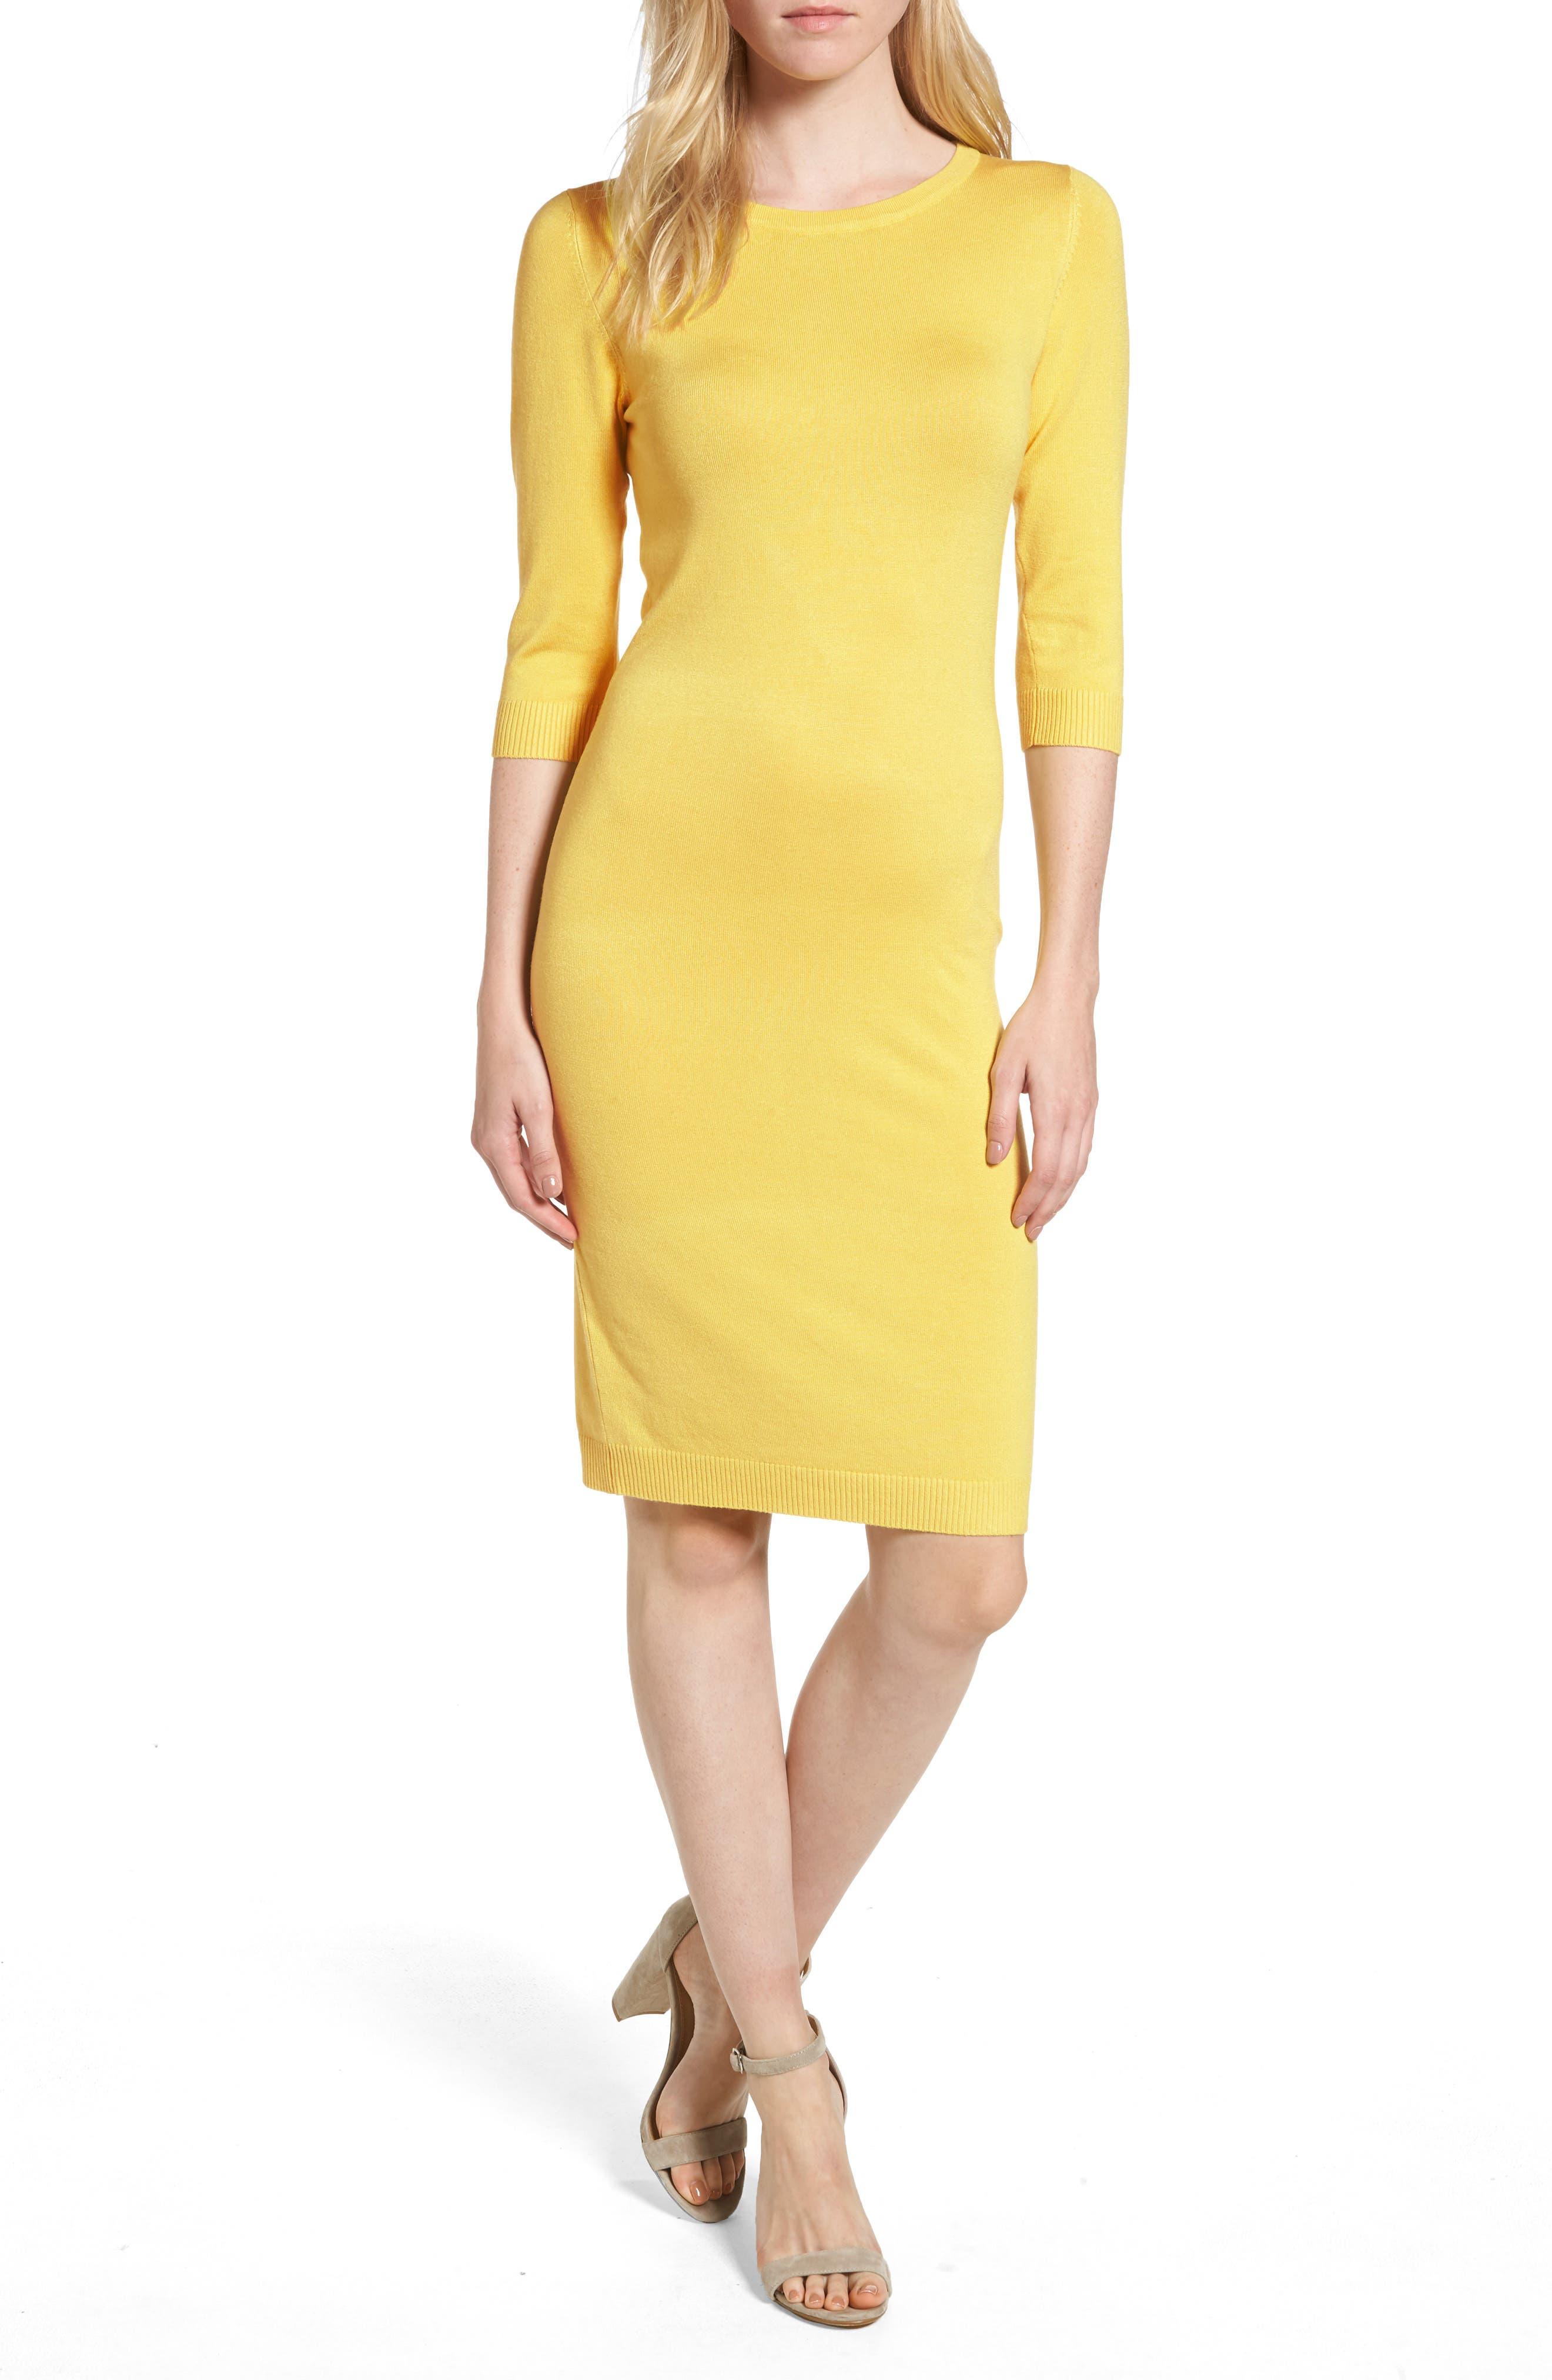 Sentimental NY Elbow Sleeve Sweater Dress